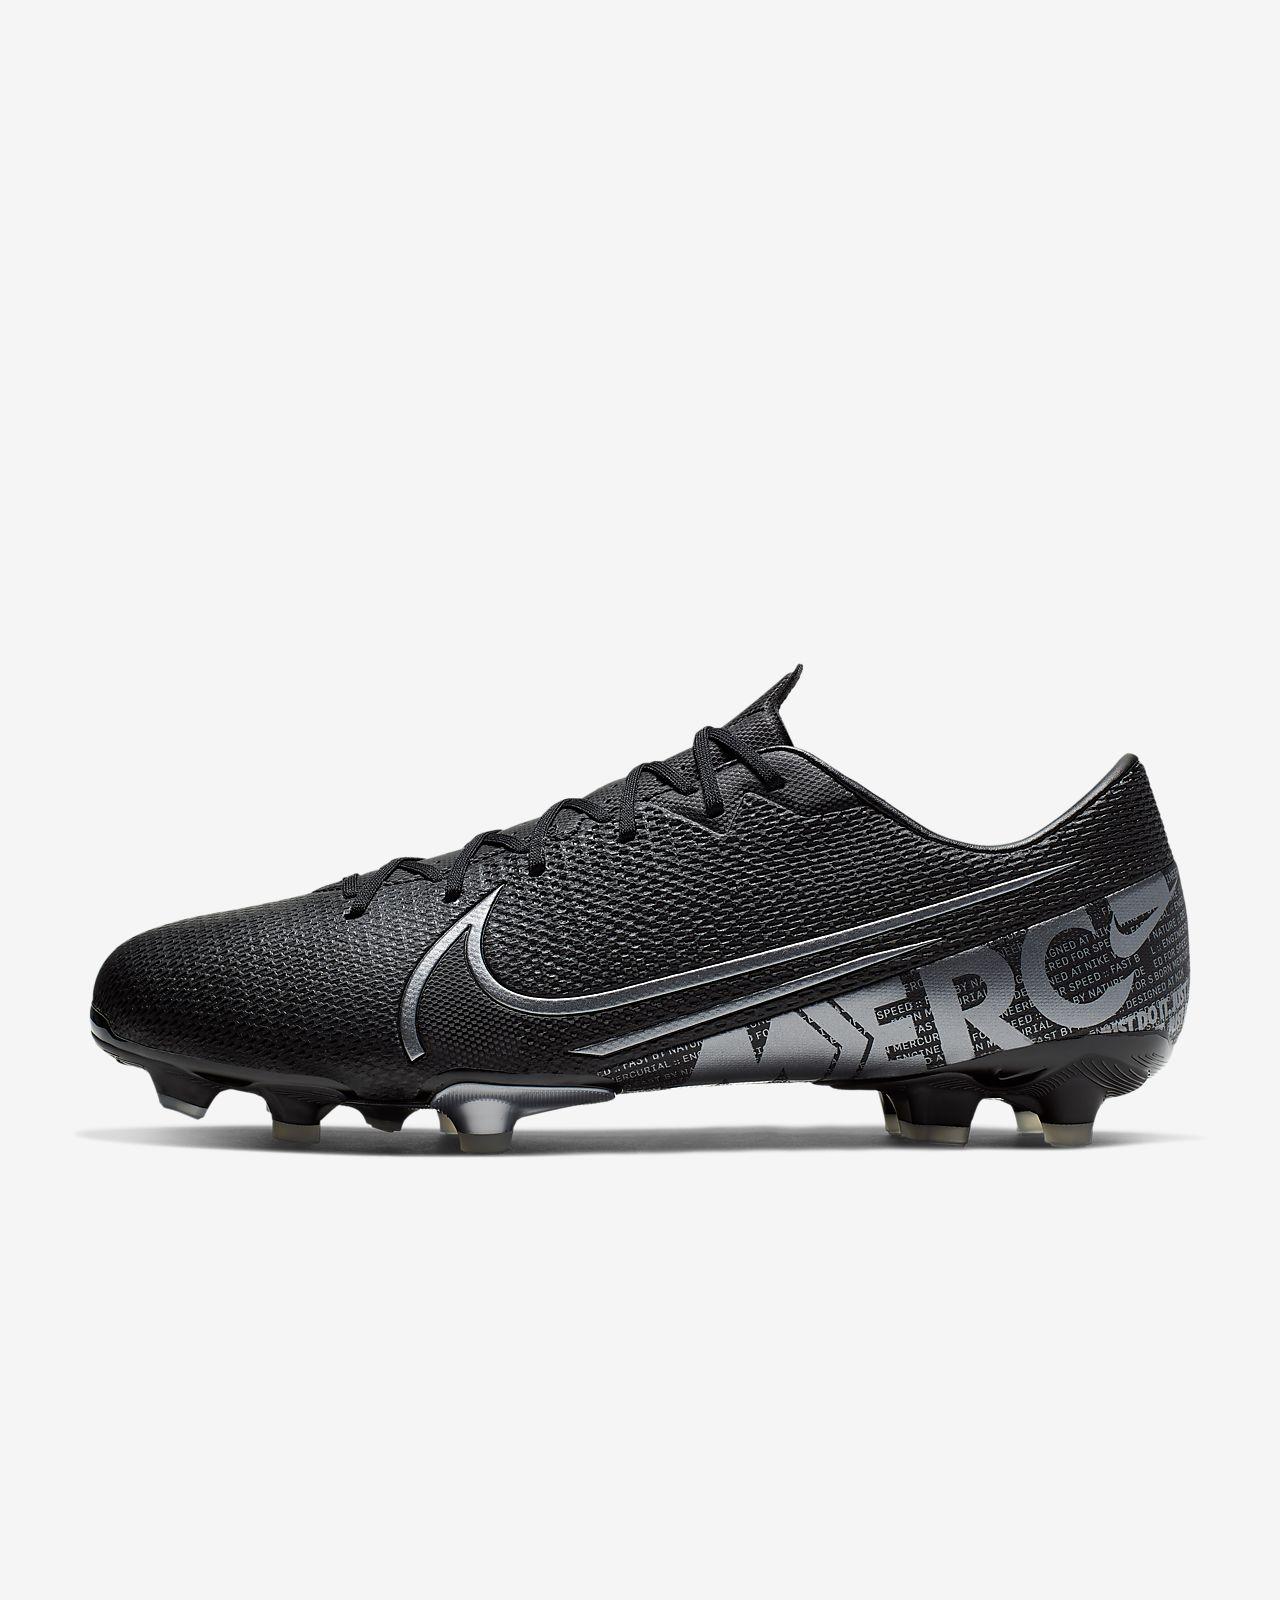 mejor proveedor buscar autorización imágenes oficiales Nike Mercurial Vapor 13 Academy MG Multi-Ground Football Boot. Nike LU